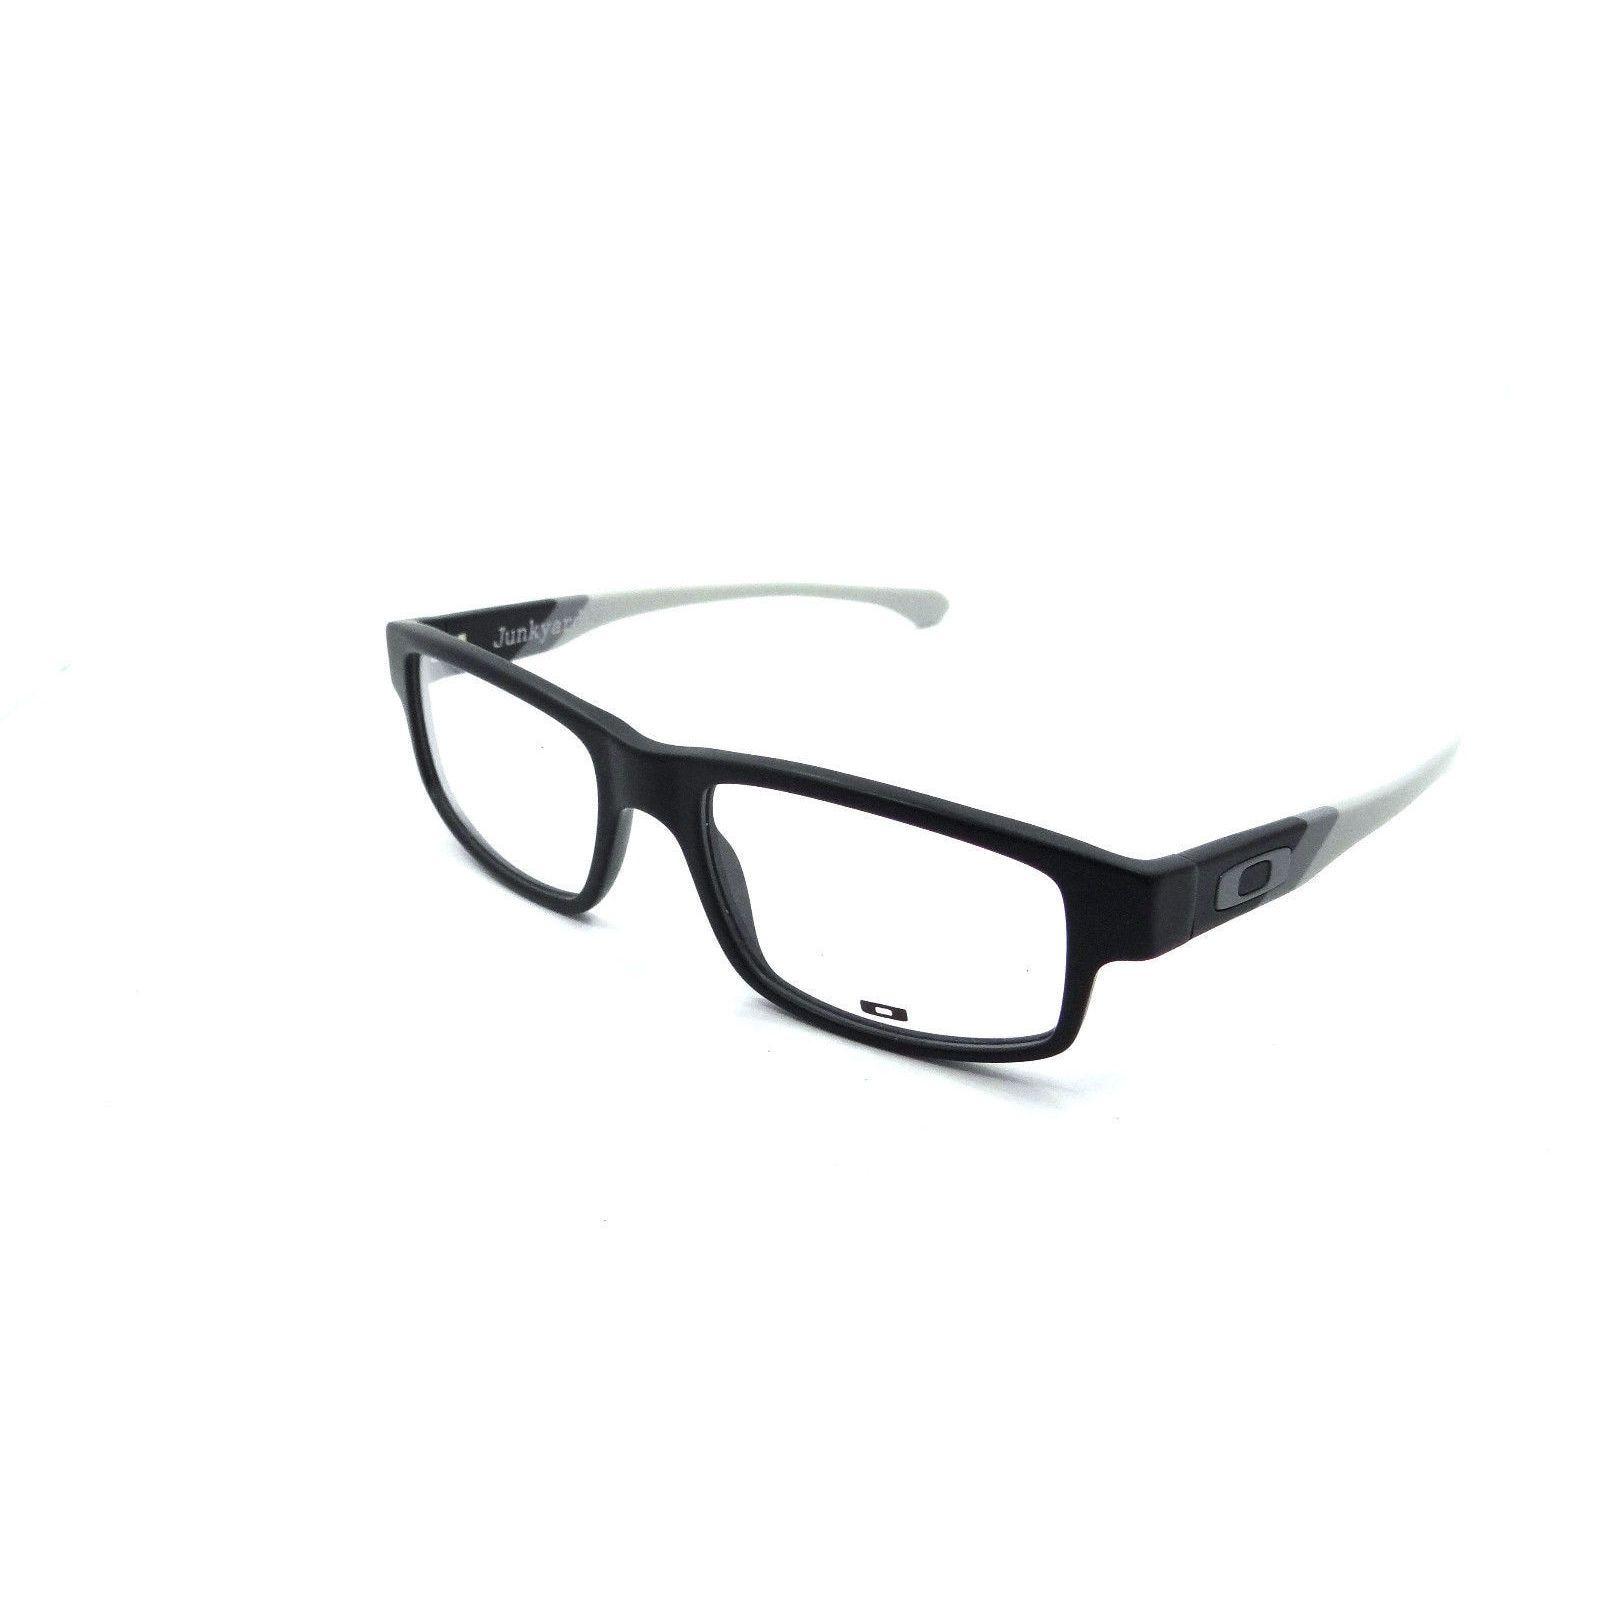 Oakley Junkyard OX1097 Eyeglasses Black Grey Frame 53MM by